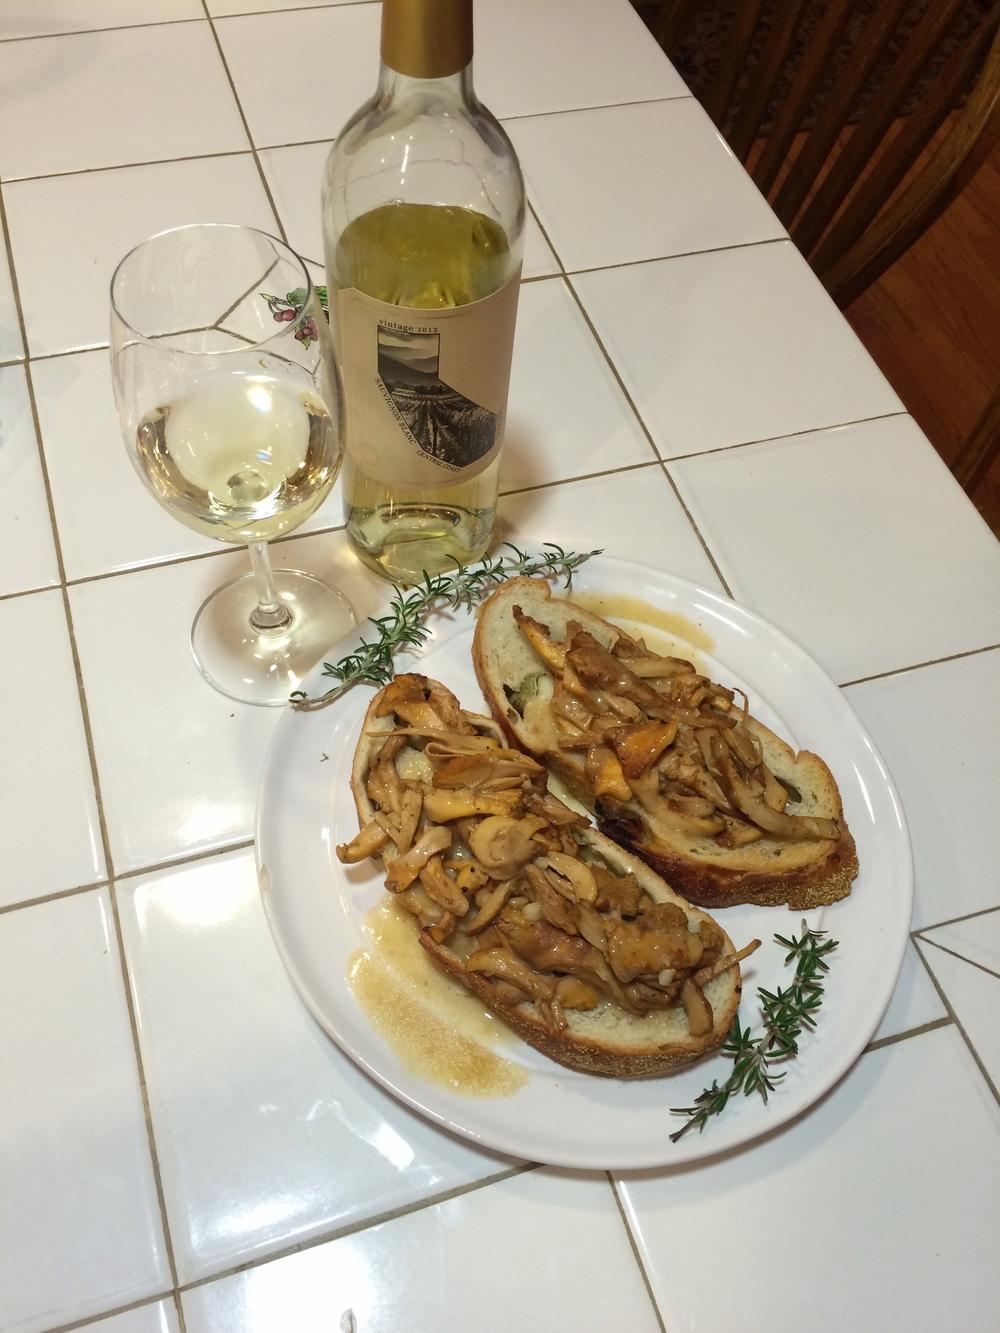 Chanterelle toast with Sauvignon Blanc, yum.